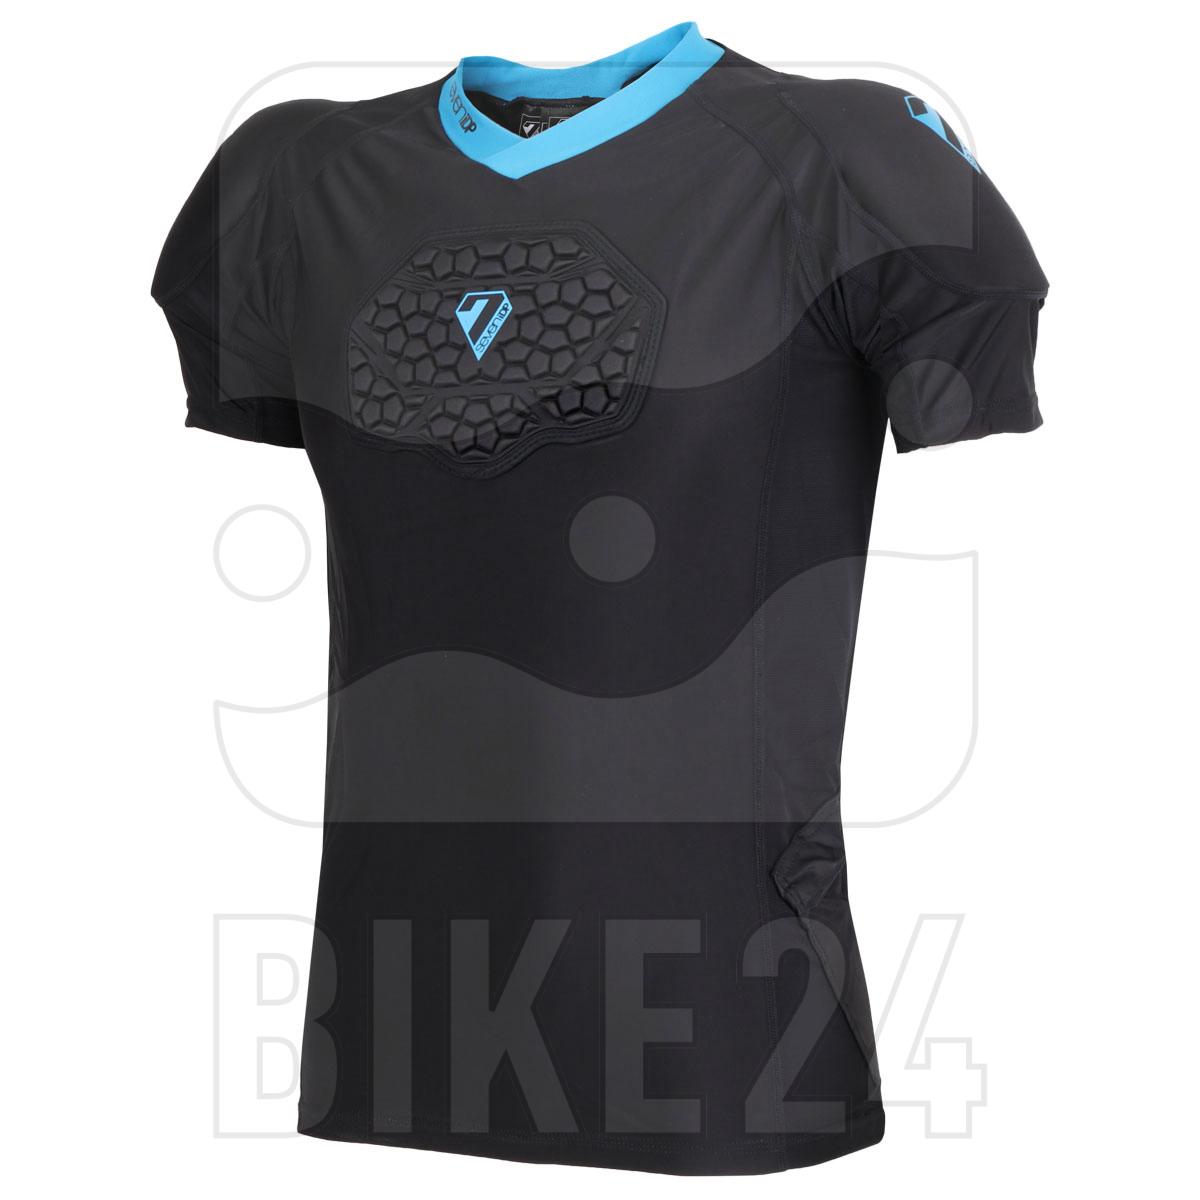 7 Protection 7iDP Flex Body Suit Protector T-Shirt - black-blue